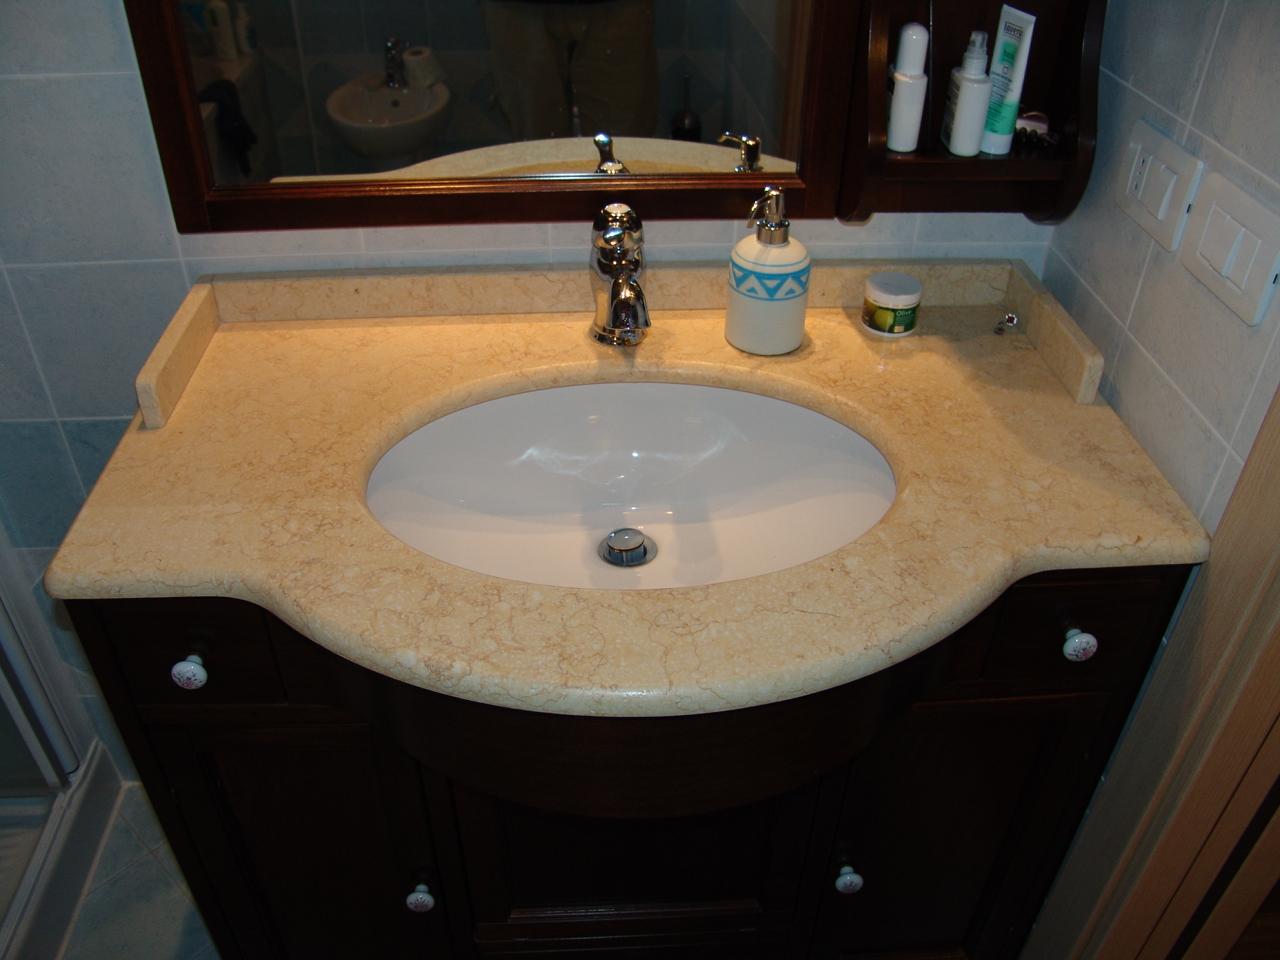 Top bagno marmo prezzi rivestimento bagno rimini santarcangelo di